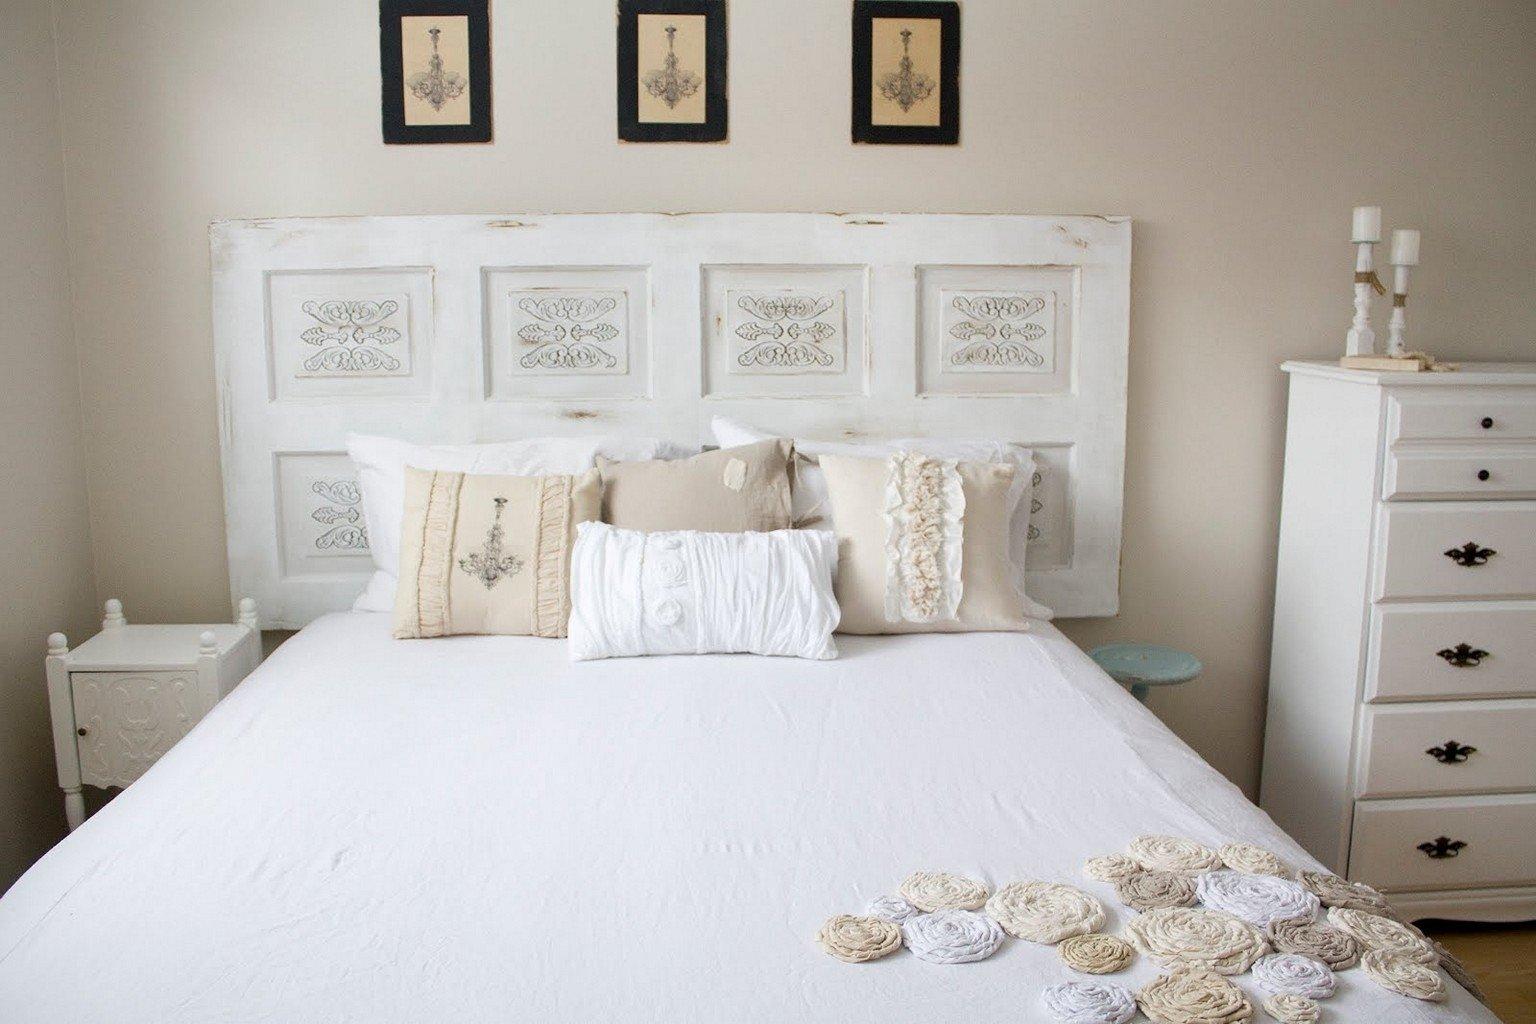 10 Fantastic Diy Headboard Ideas For Queen Beds diy headboard ideas for king beds pictures homestylediary 2020